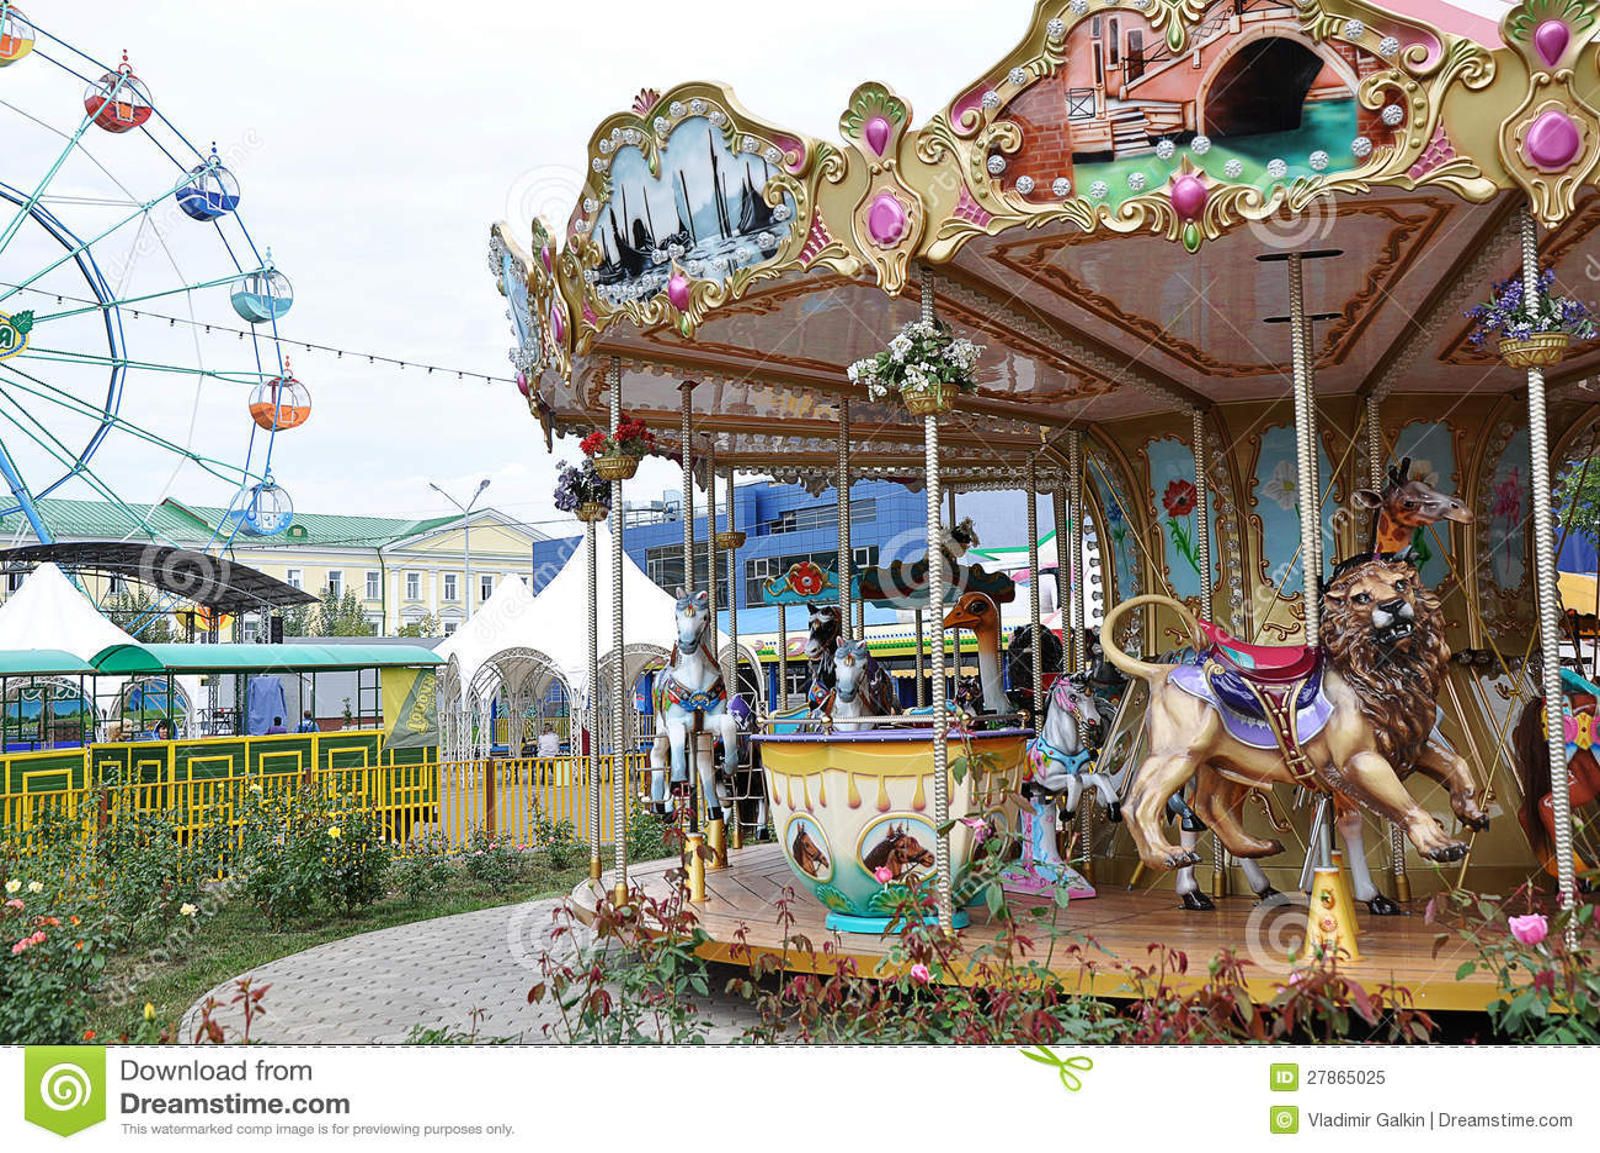 Children carousel czerepy